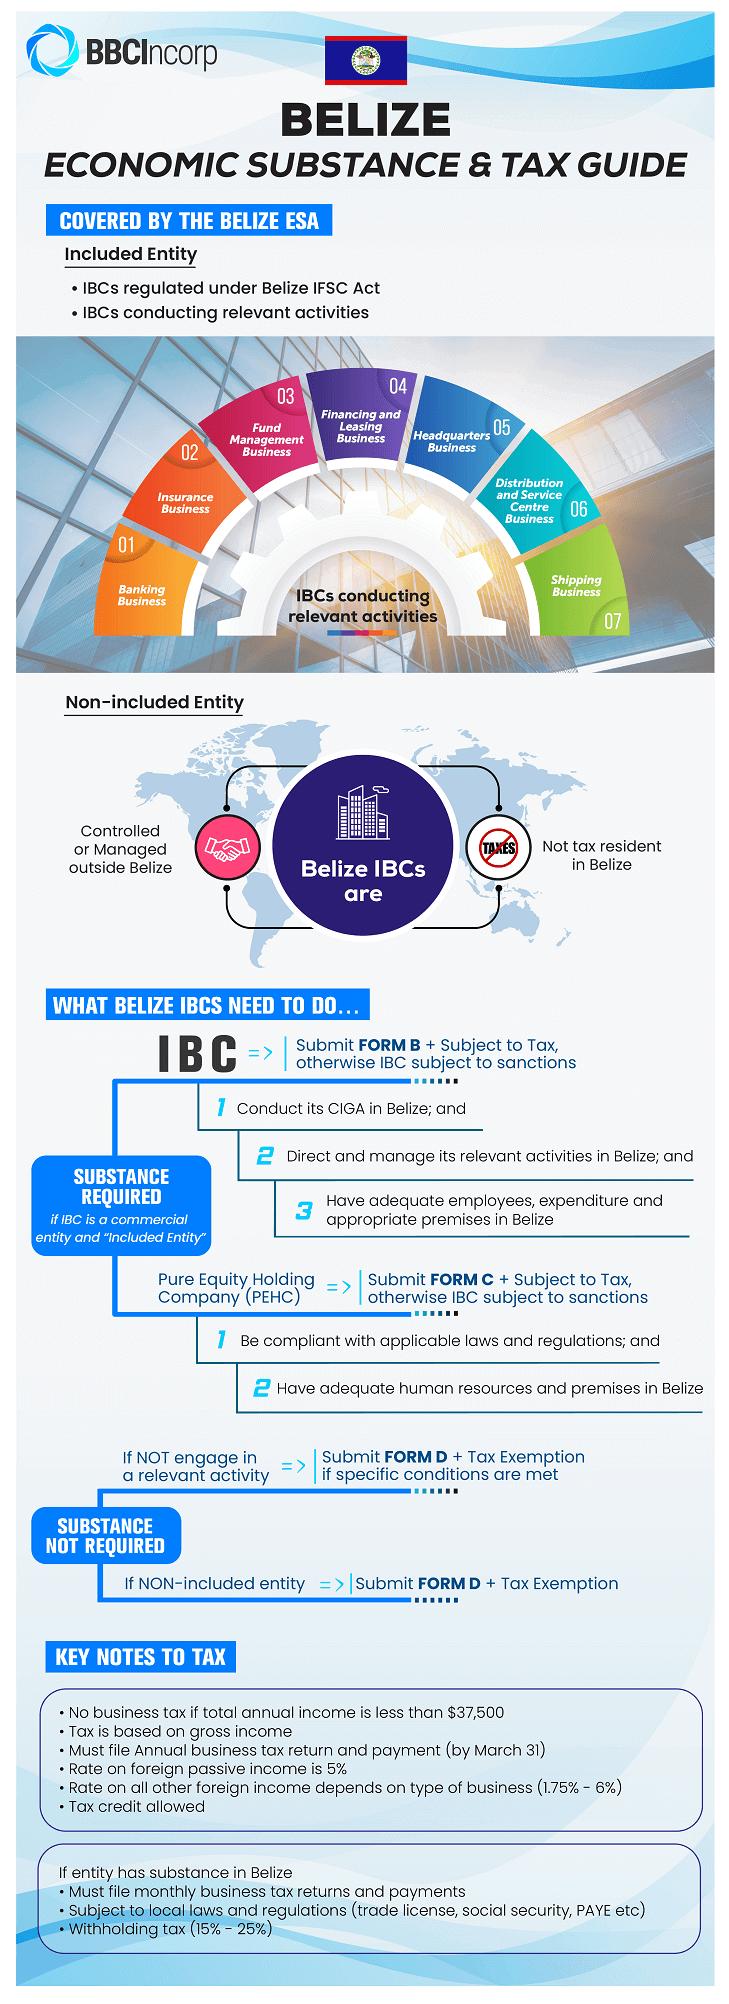 Belize economic substance requirements & Tax Guide